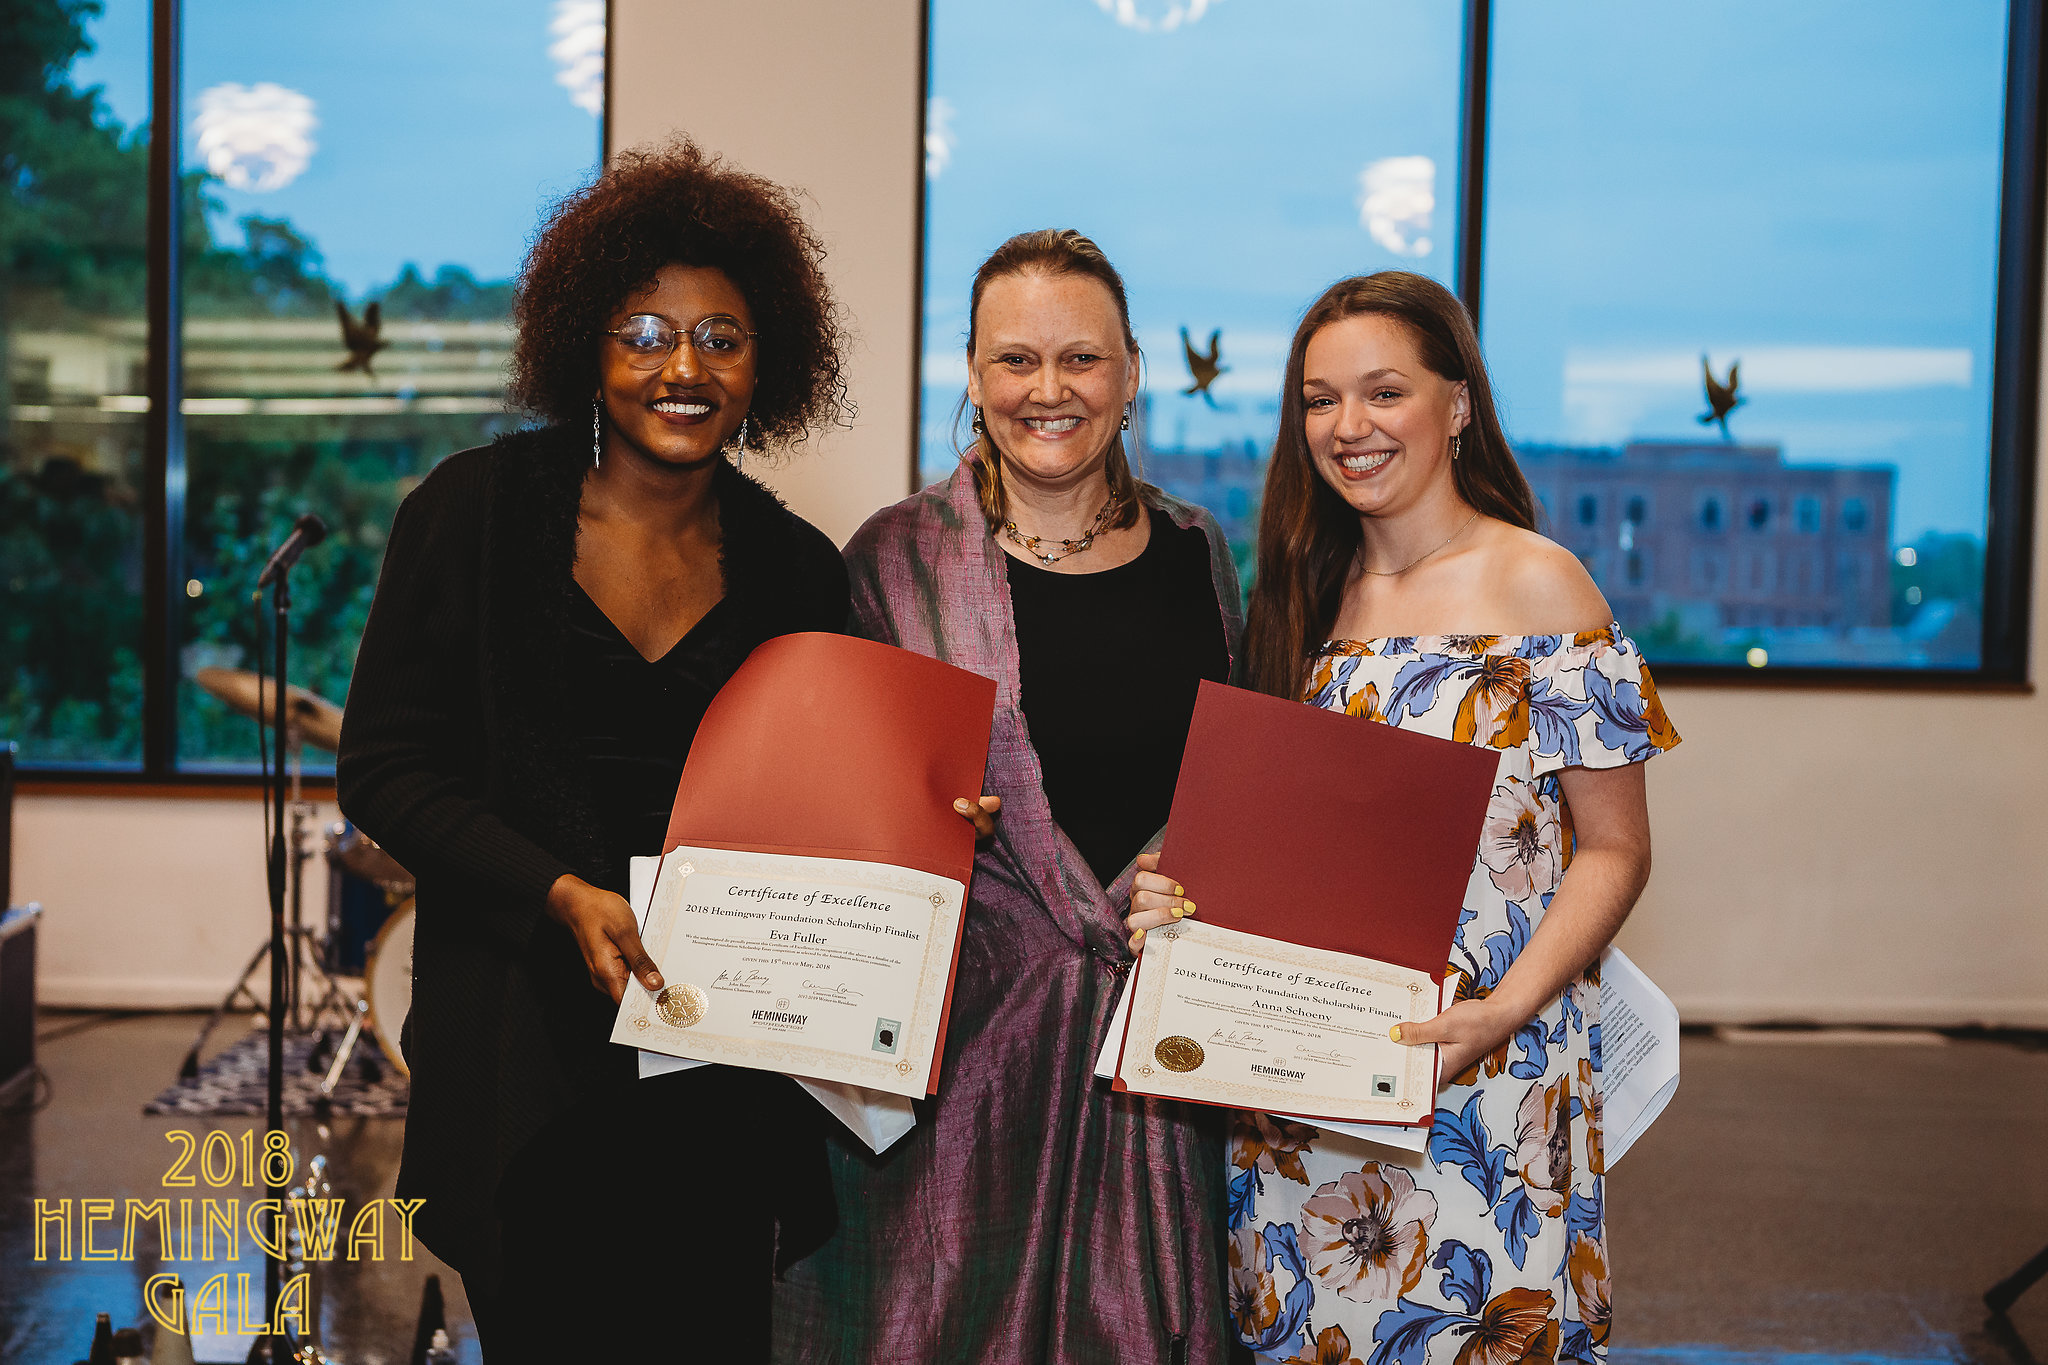 Hemingway Scholarship OPRF high school award finalists